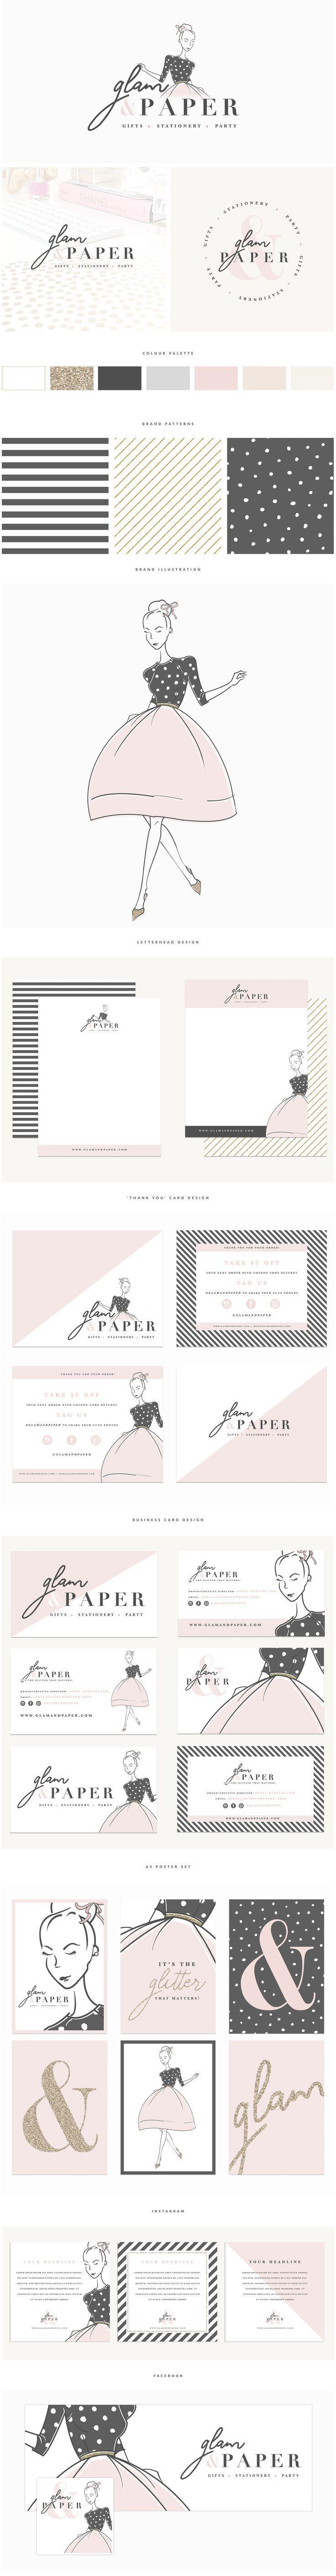 Brand Design   Glam & Paper » Brand Me Beautiful                                                                                                                                                                                 More